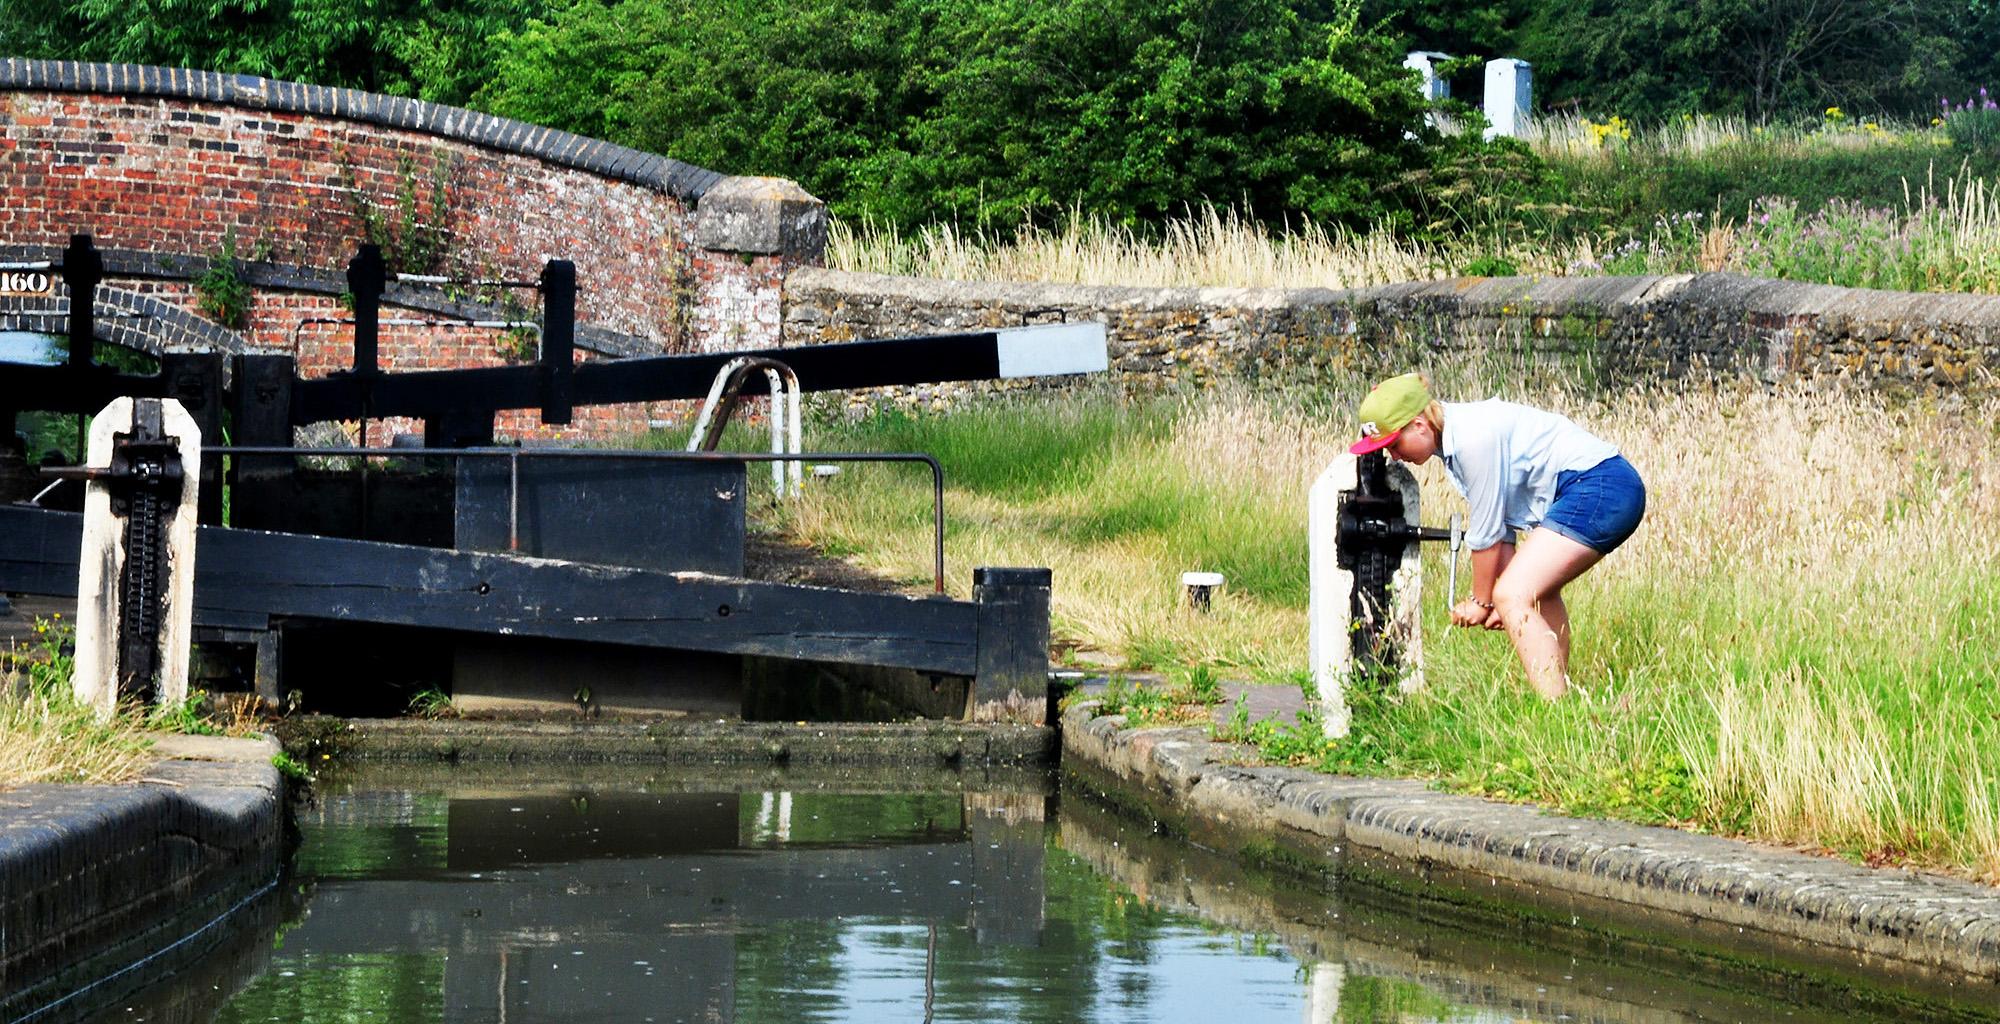 Hiring a narrow boat in England